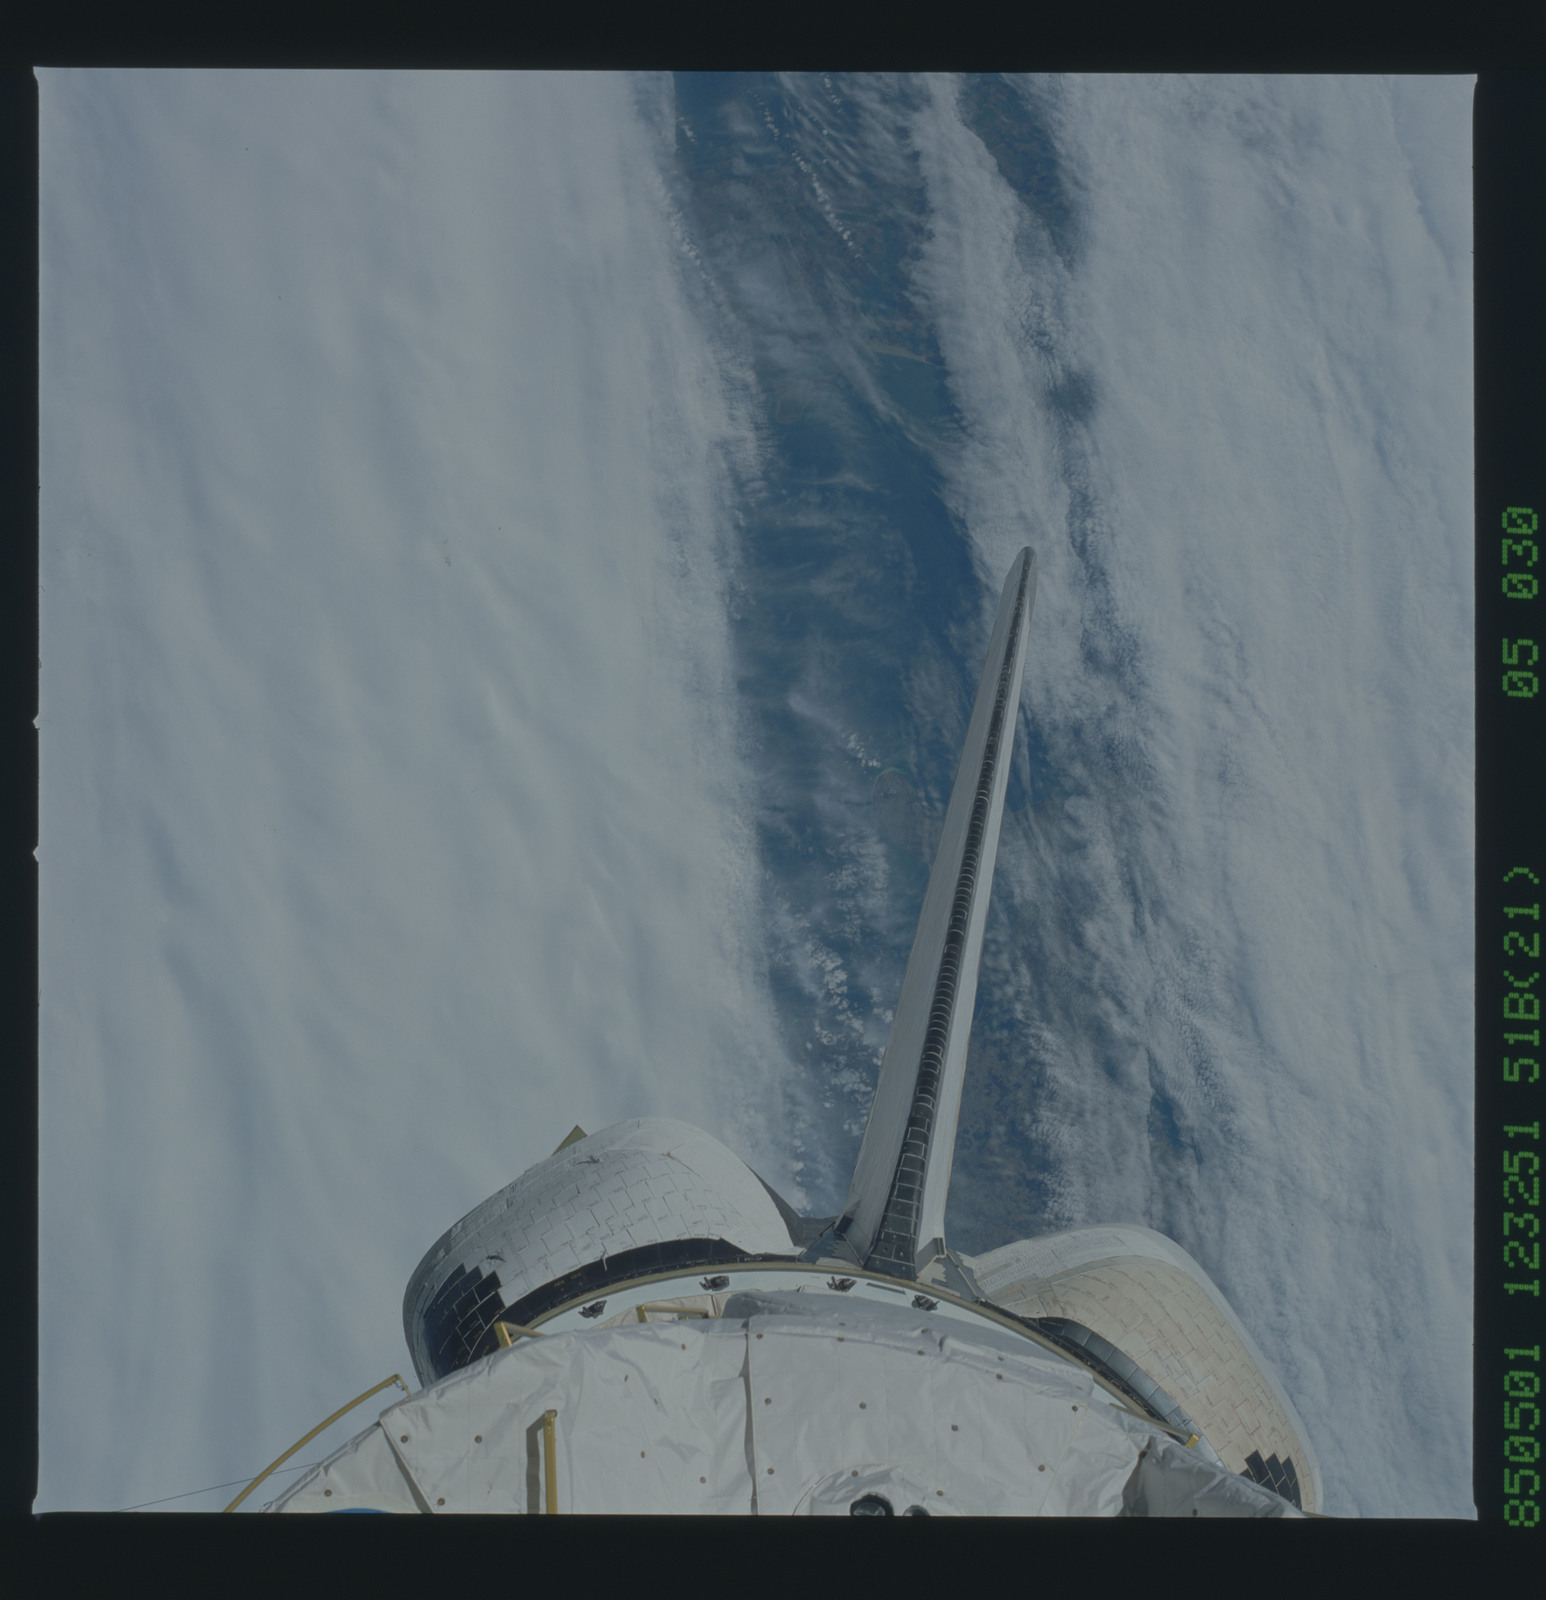 51B-35-030 - STS-51B - 51B earth observation